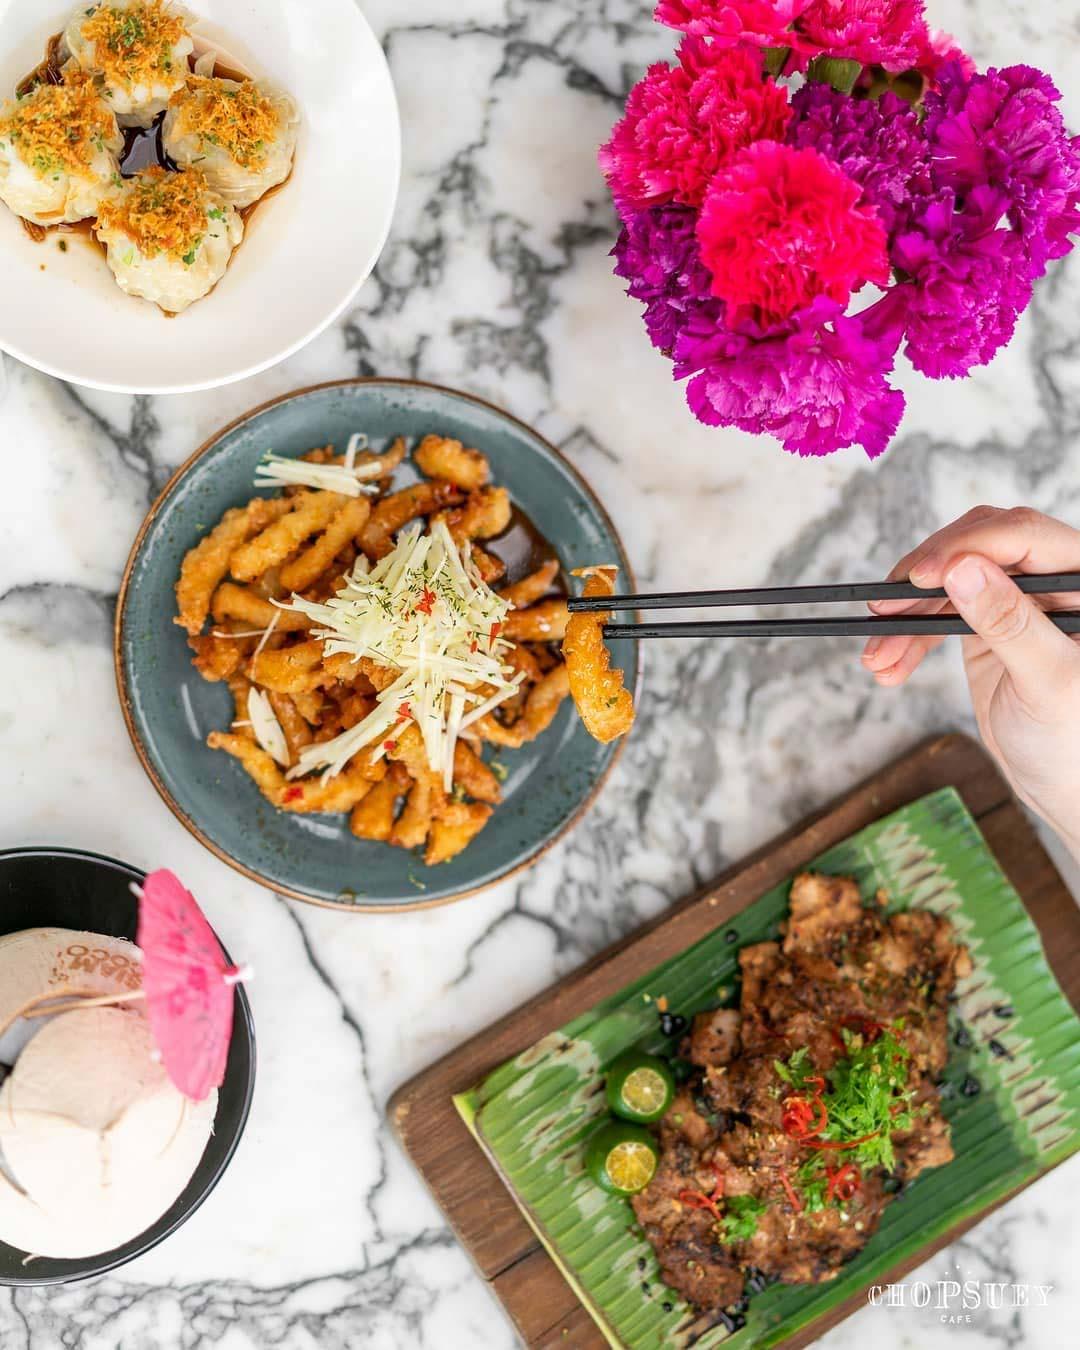 Dempsey Hil Restaurants - Chopsuey Cafe food